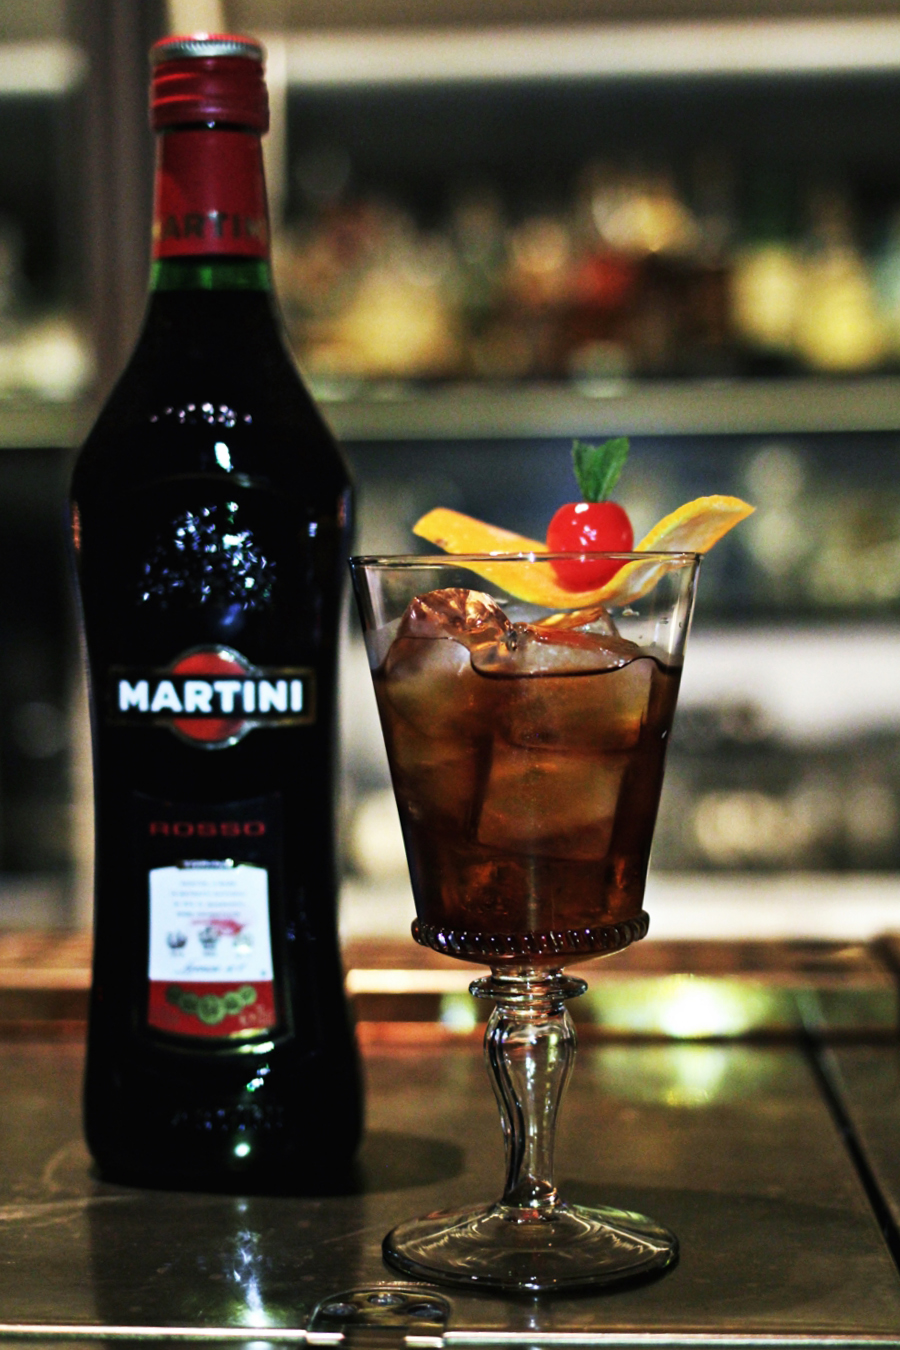 martini rosso apertif drink